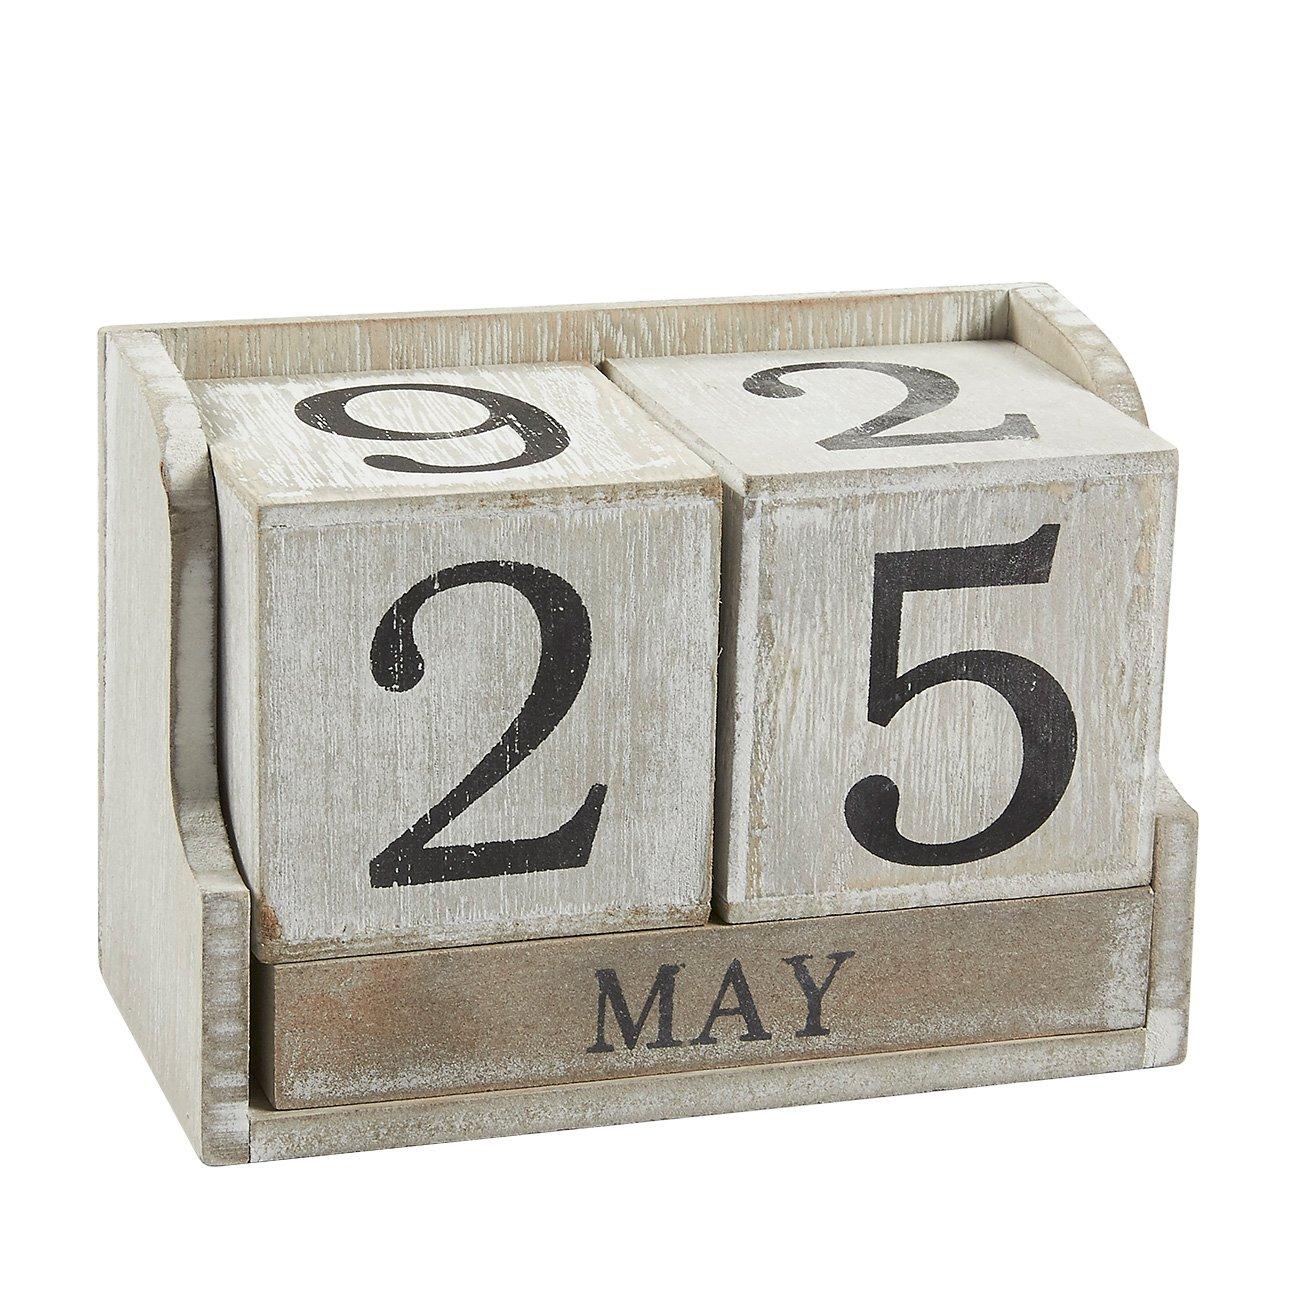 Calendar Block - Wooden Perpetual Desk Calendar - Home and Office Decor, 5.3 x 3.7 x 2.6 inches Juvale